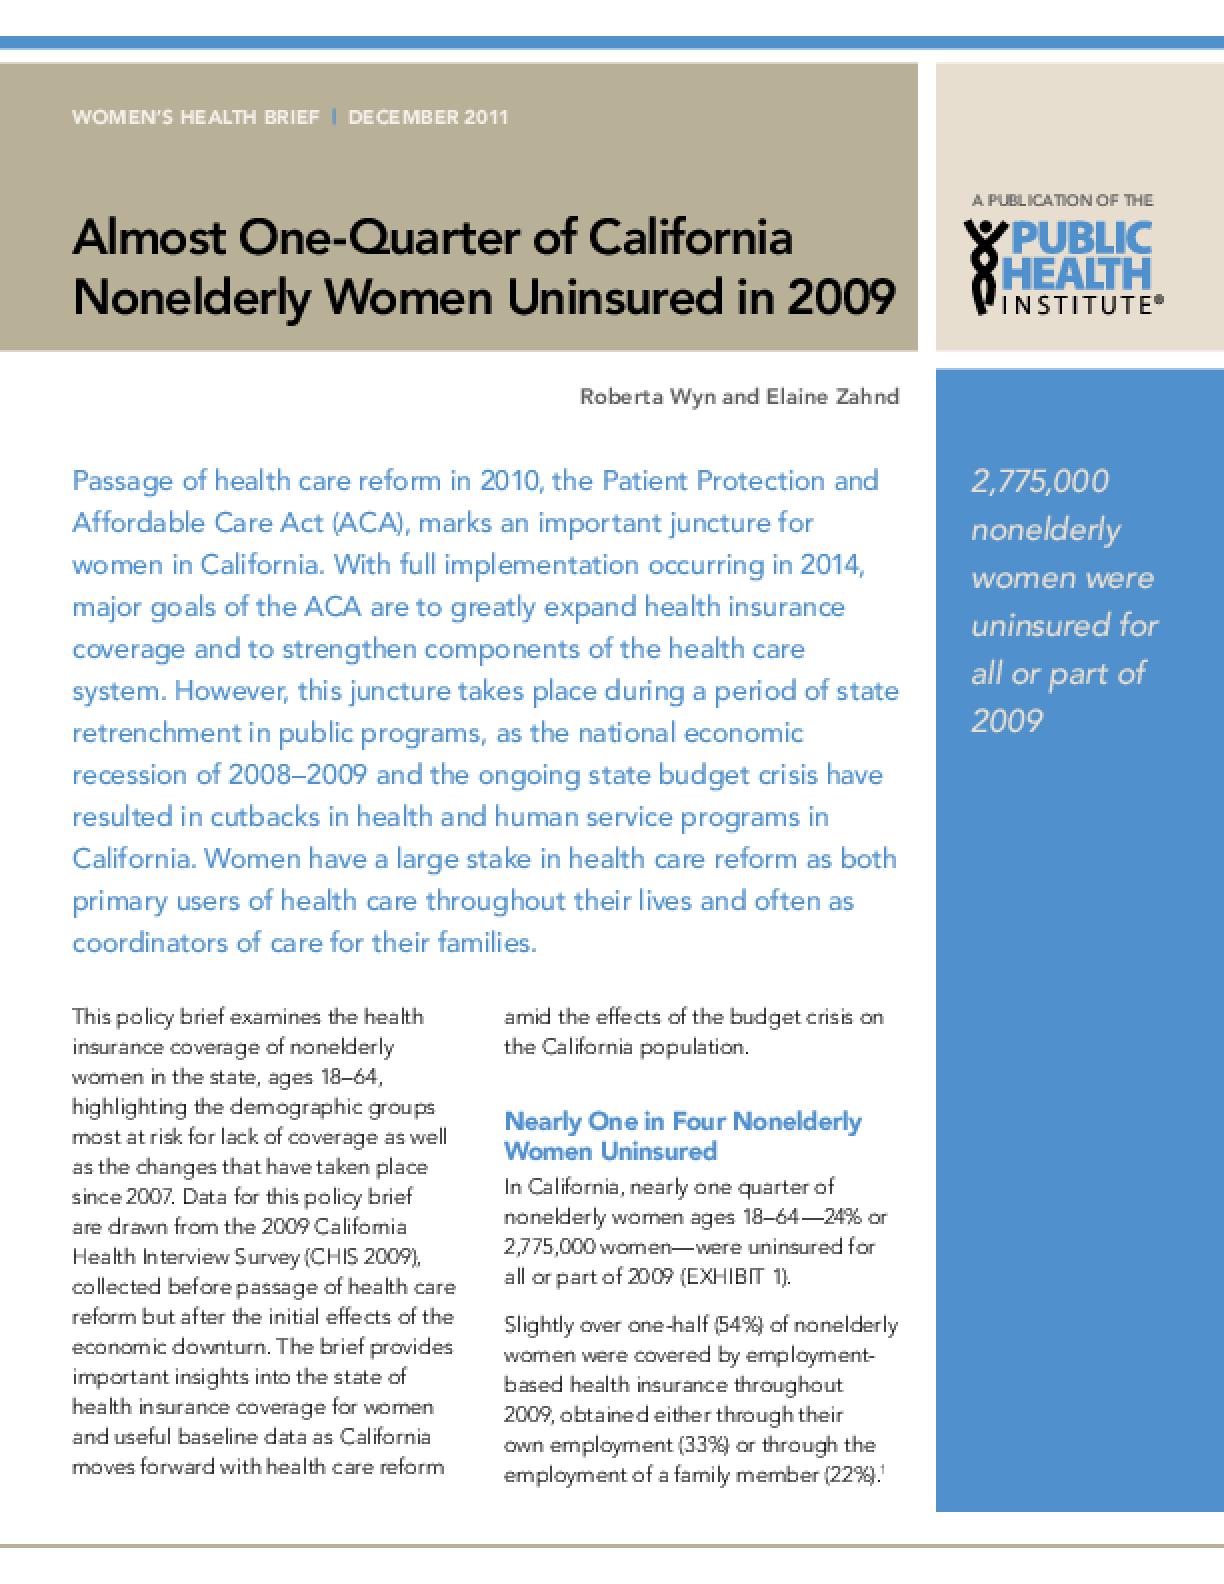 Almost One-Quarter of California Nonelderly Women Uninsured in 2009